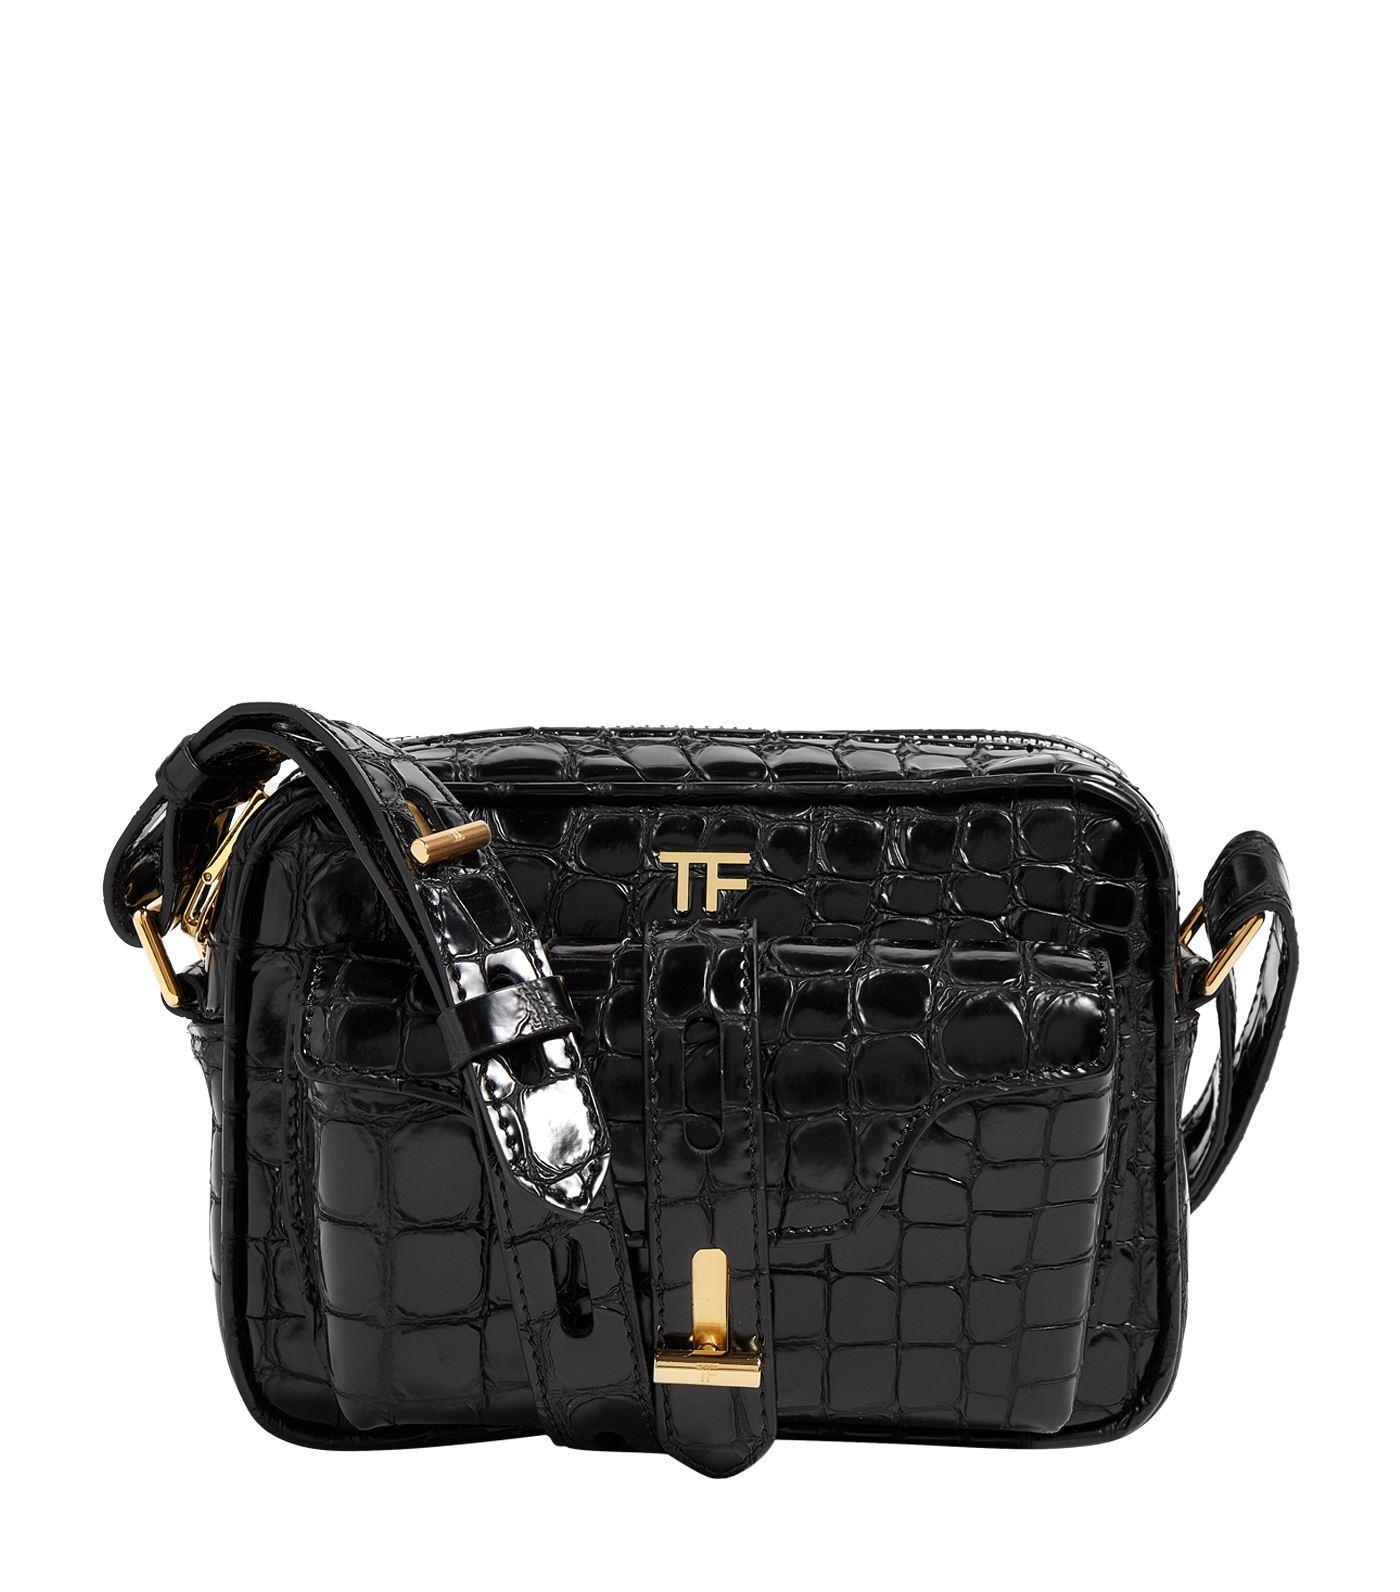 f92567a091 Lyst tom ford croc embossed twist bag in black jpg 1400x1592 Tom ford  jennifer handbag crocodile